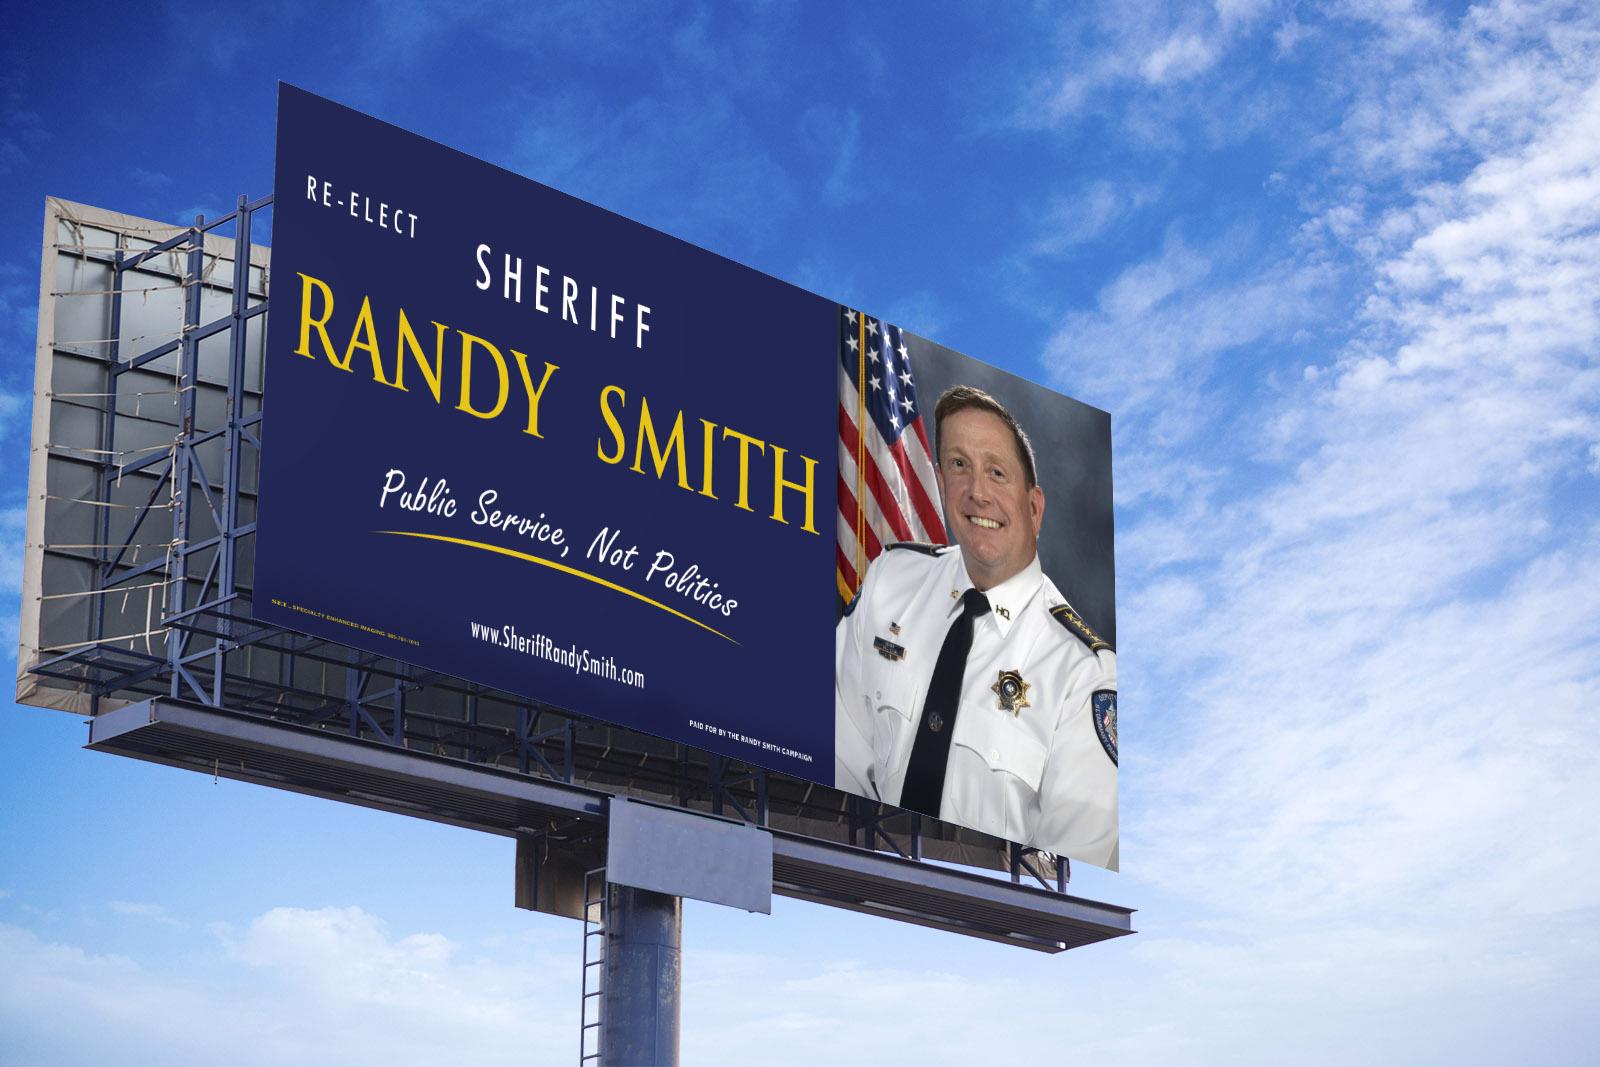 Billboard for Sheriff Randy Smith